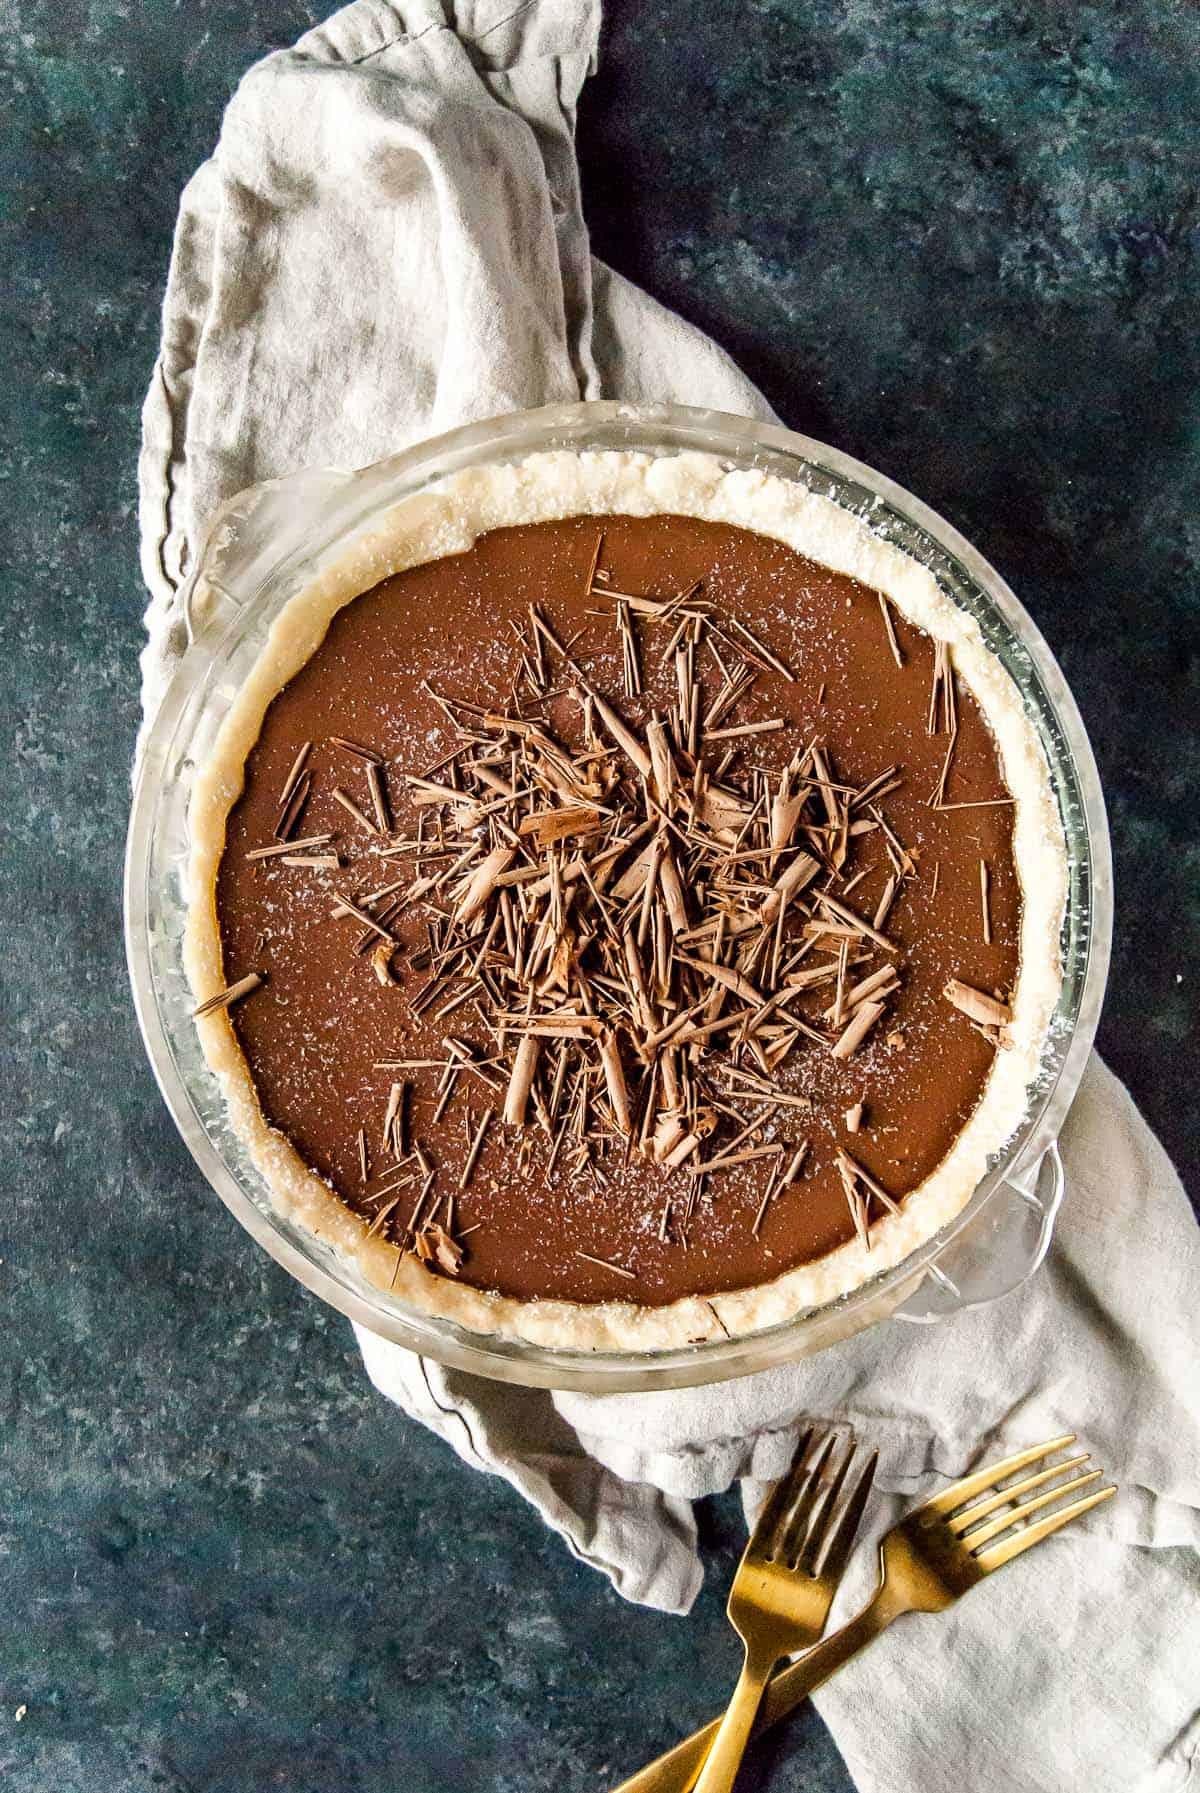 vegan chocolate cream pie with chocolate shavings